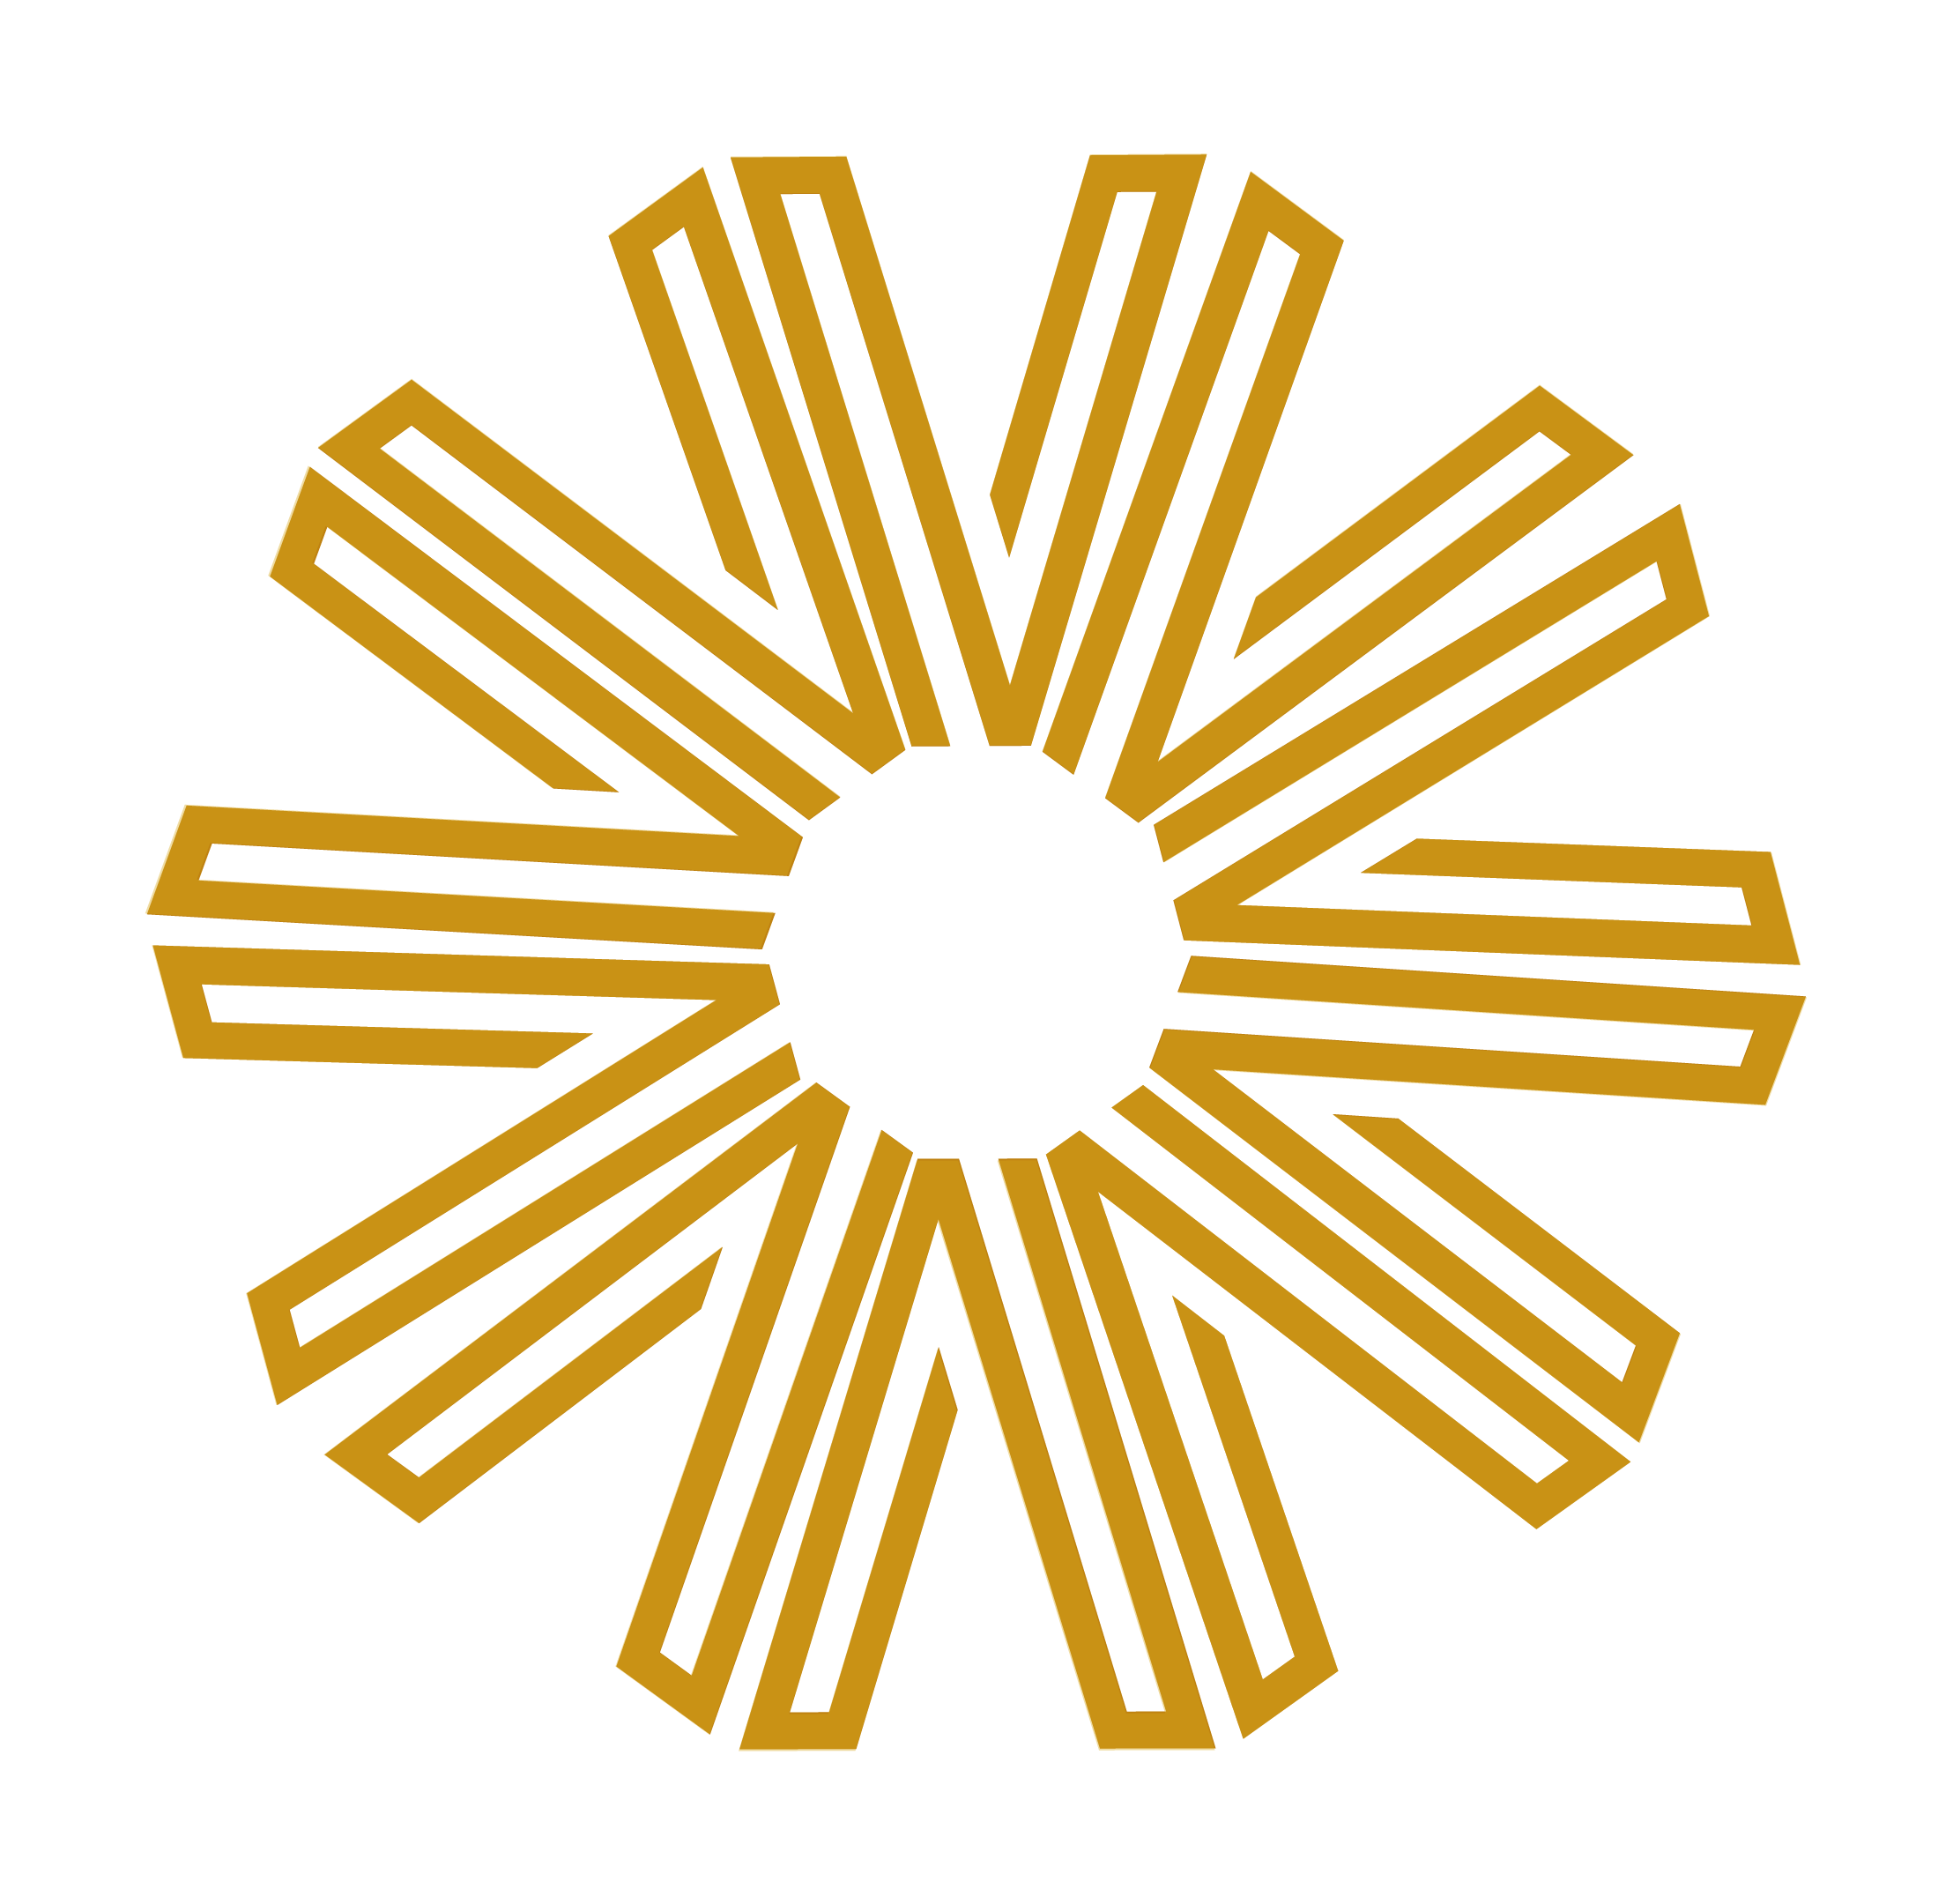 Spinning Varoom Iris image in gold